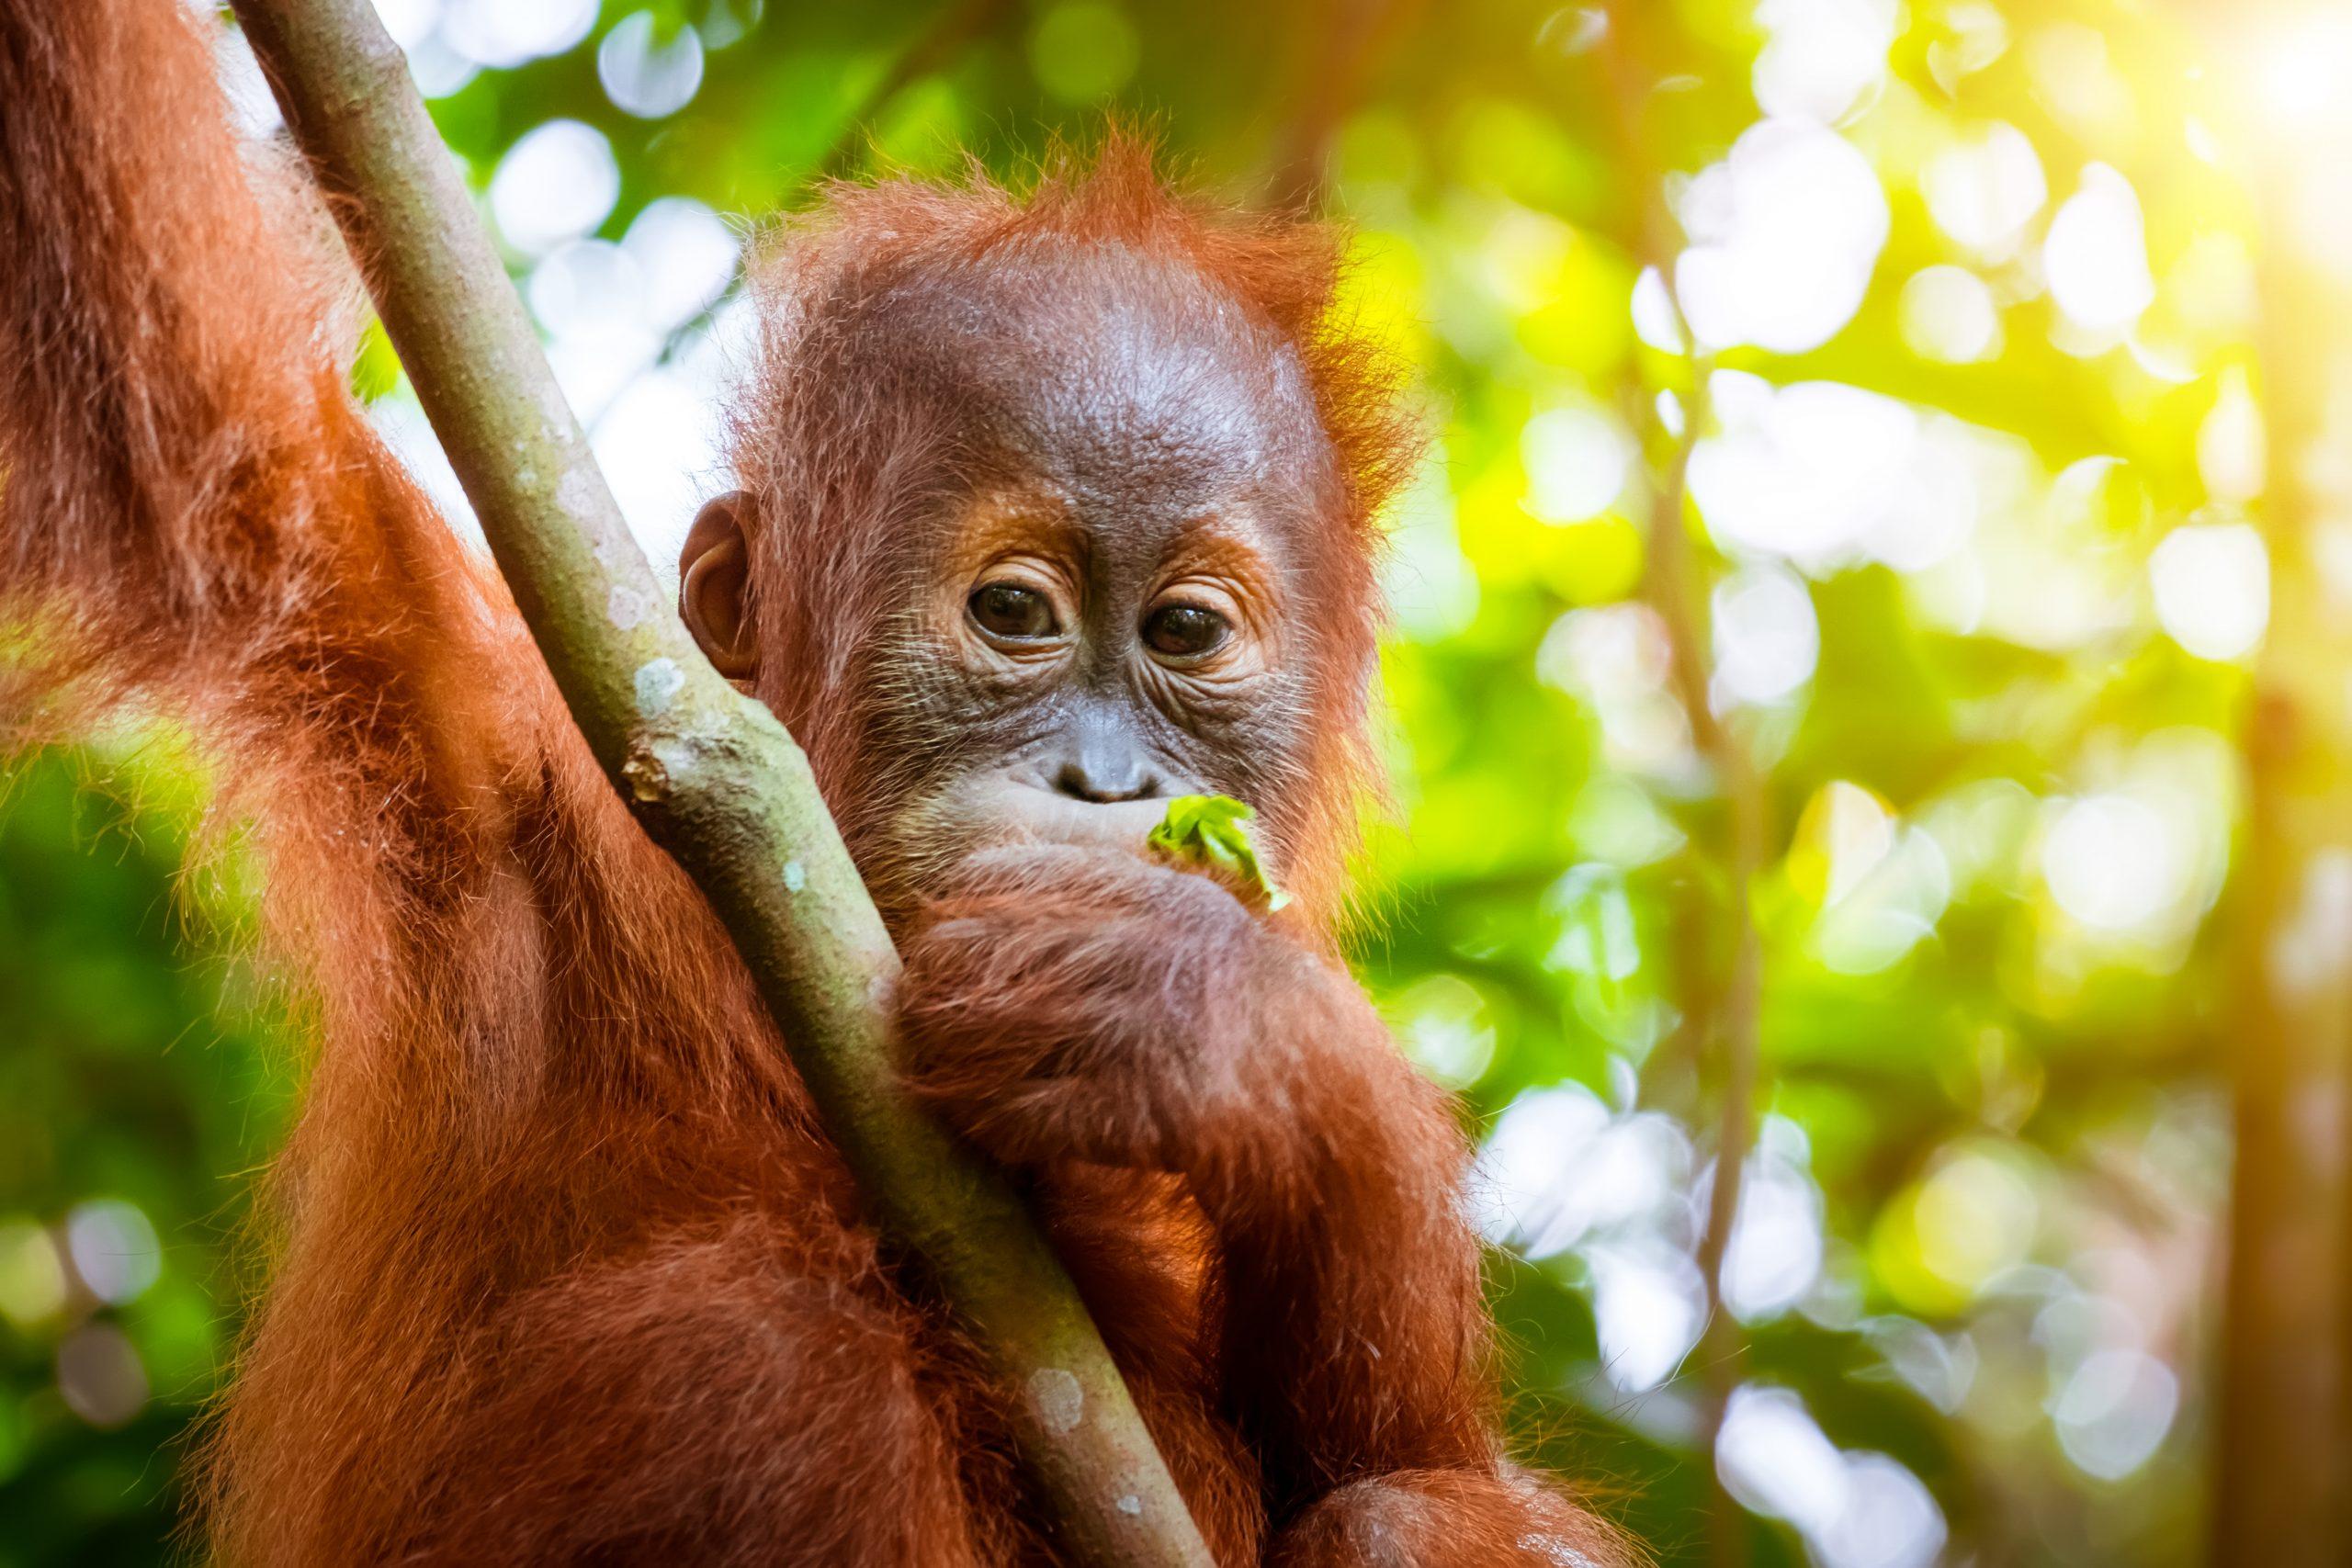 Baby orangutan in tree